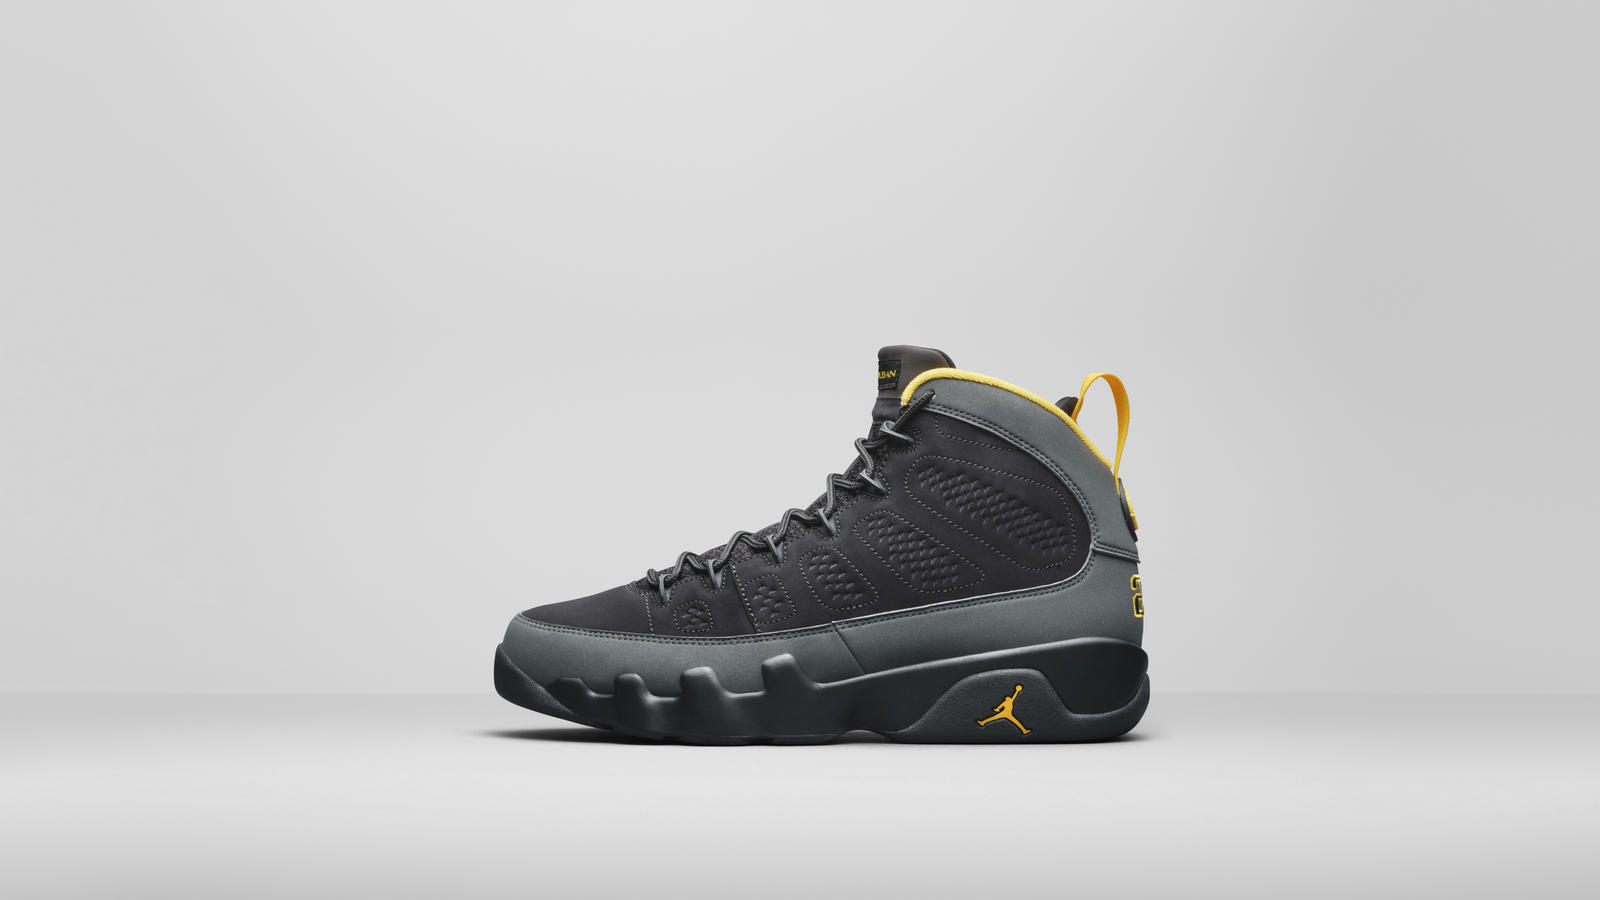 Jordan Brand Spring 2021 Retro Releases 4